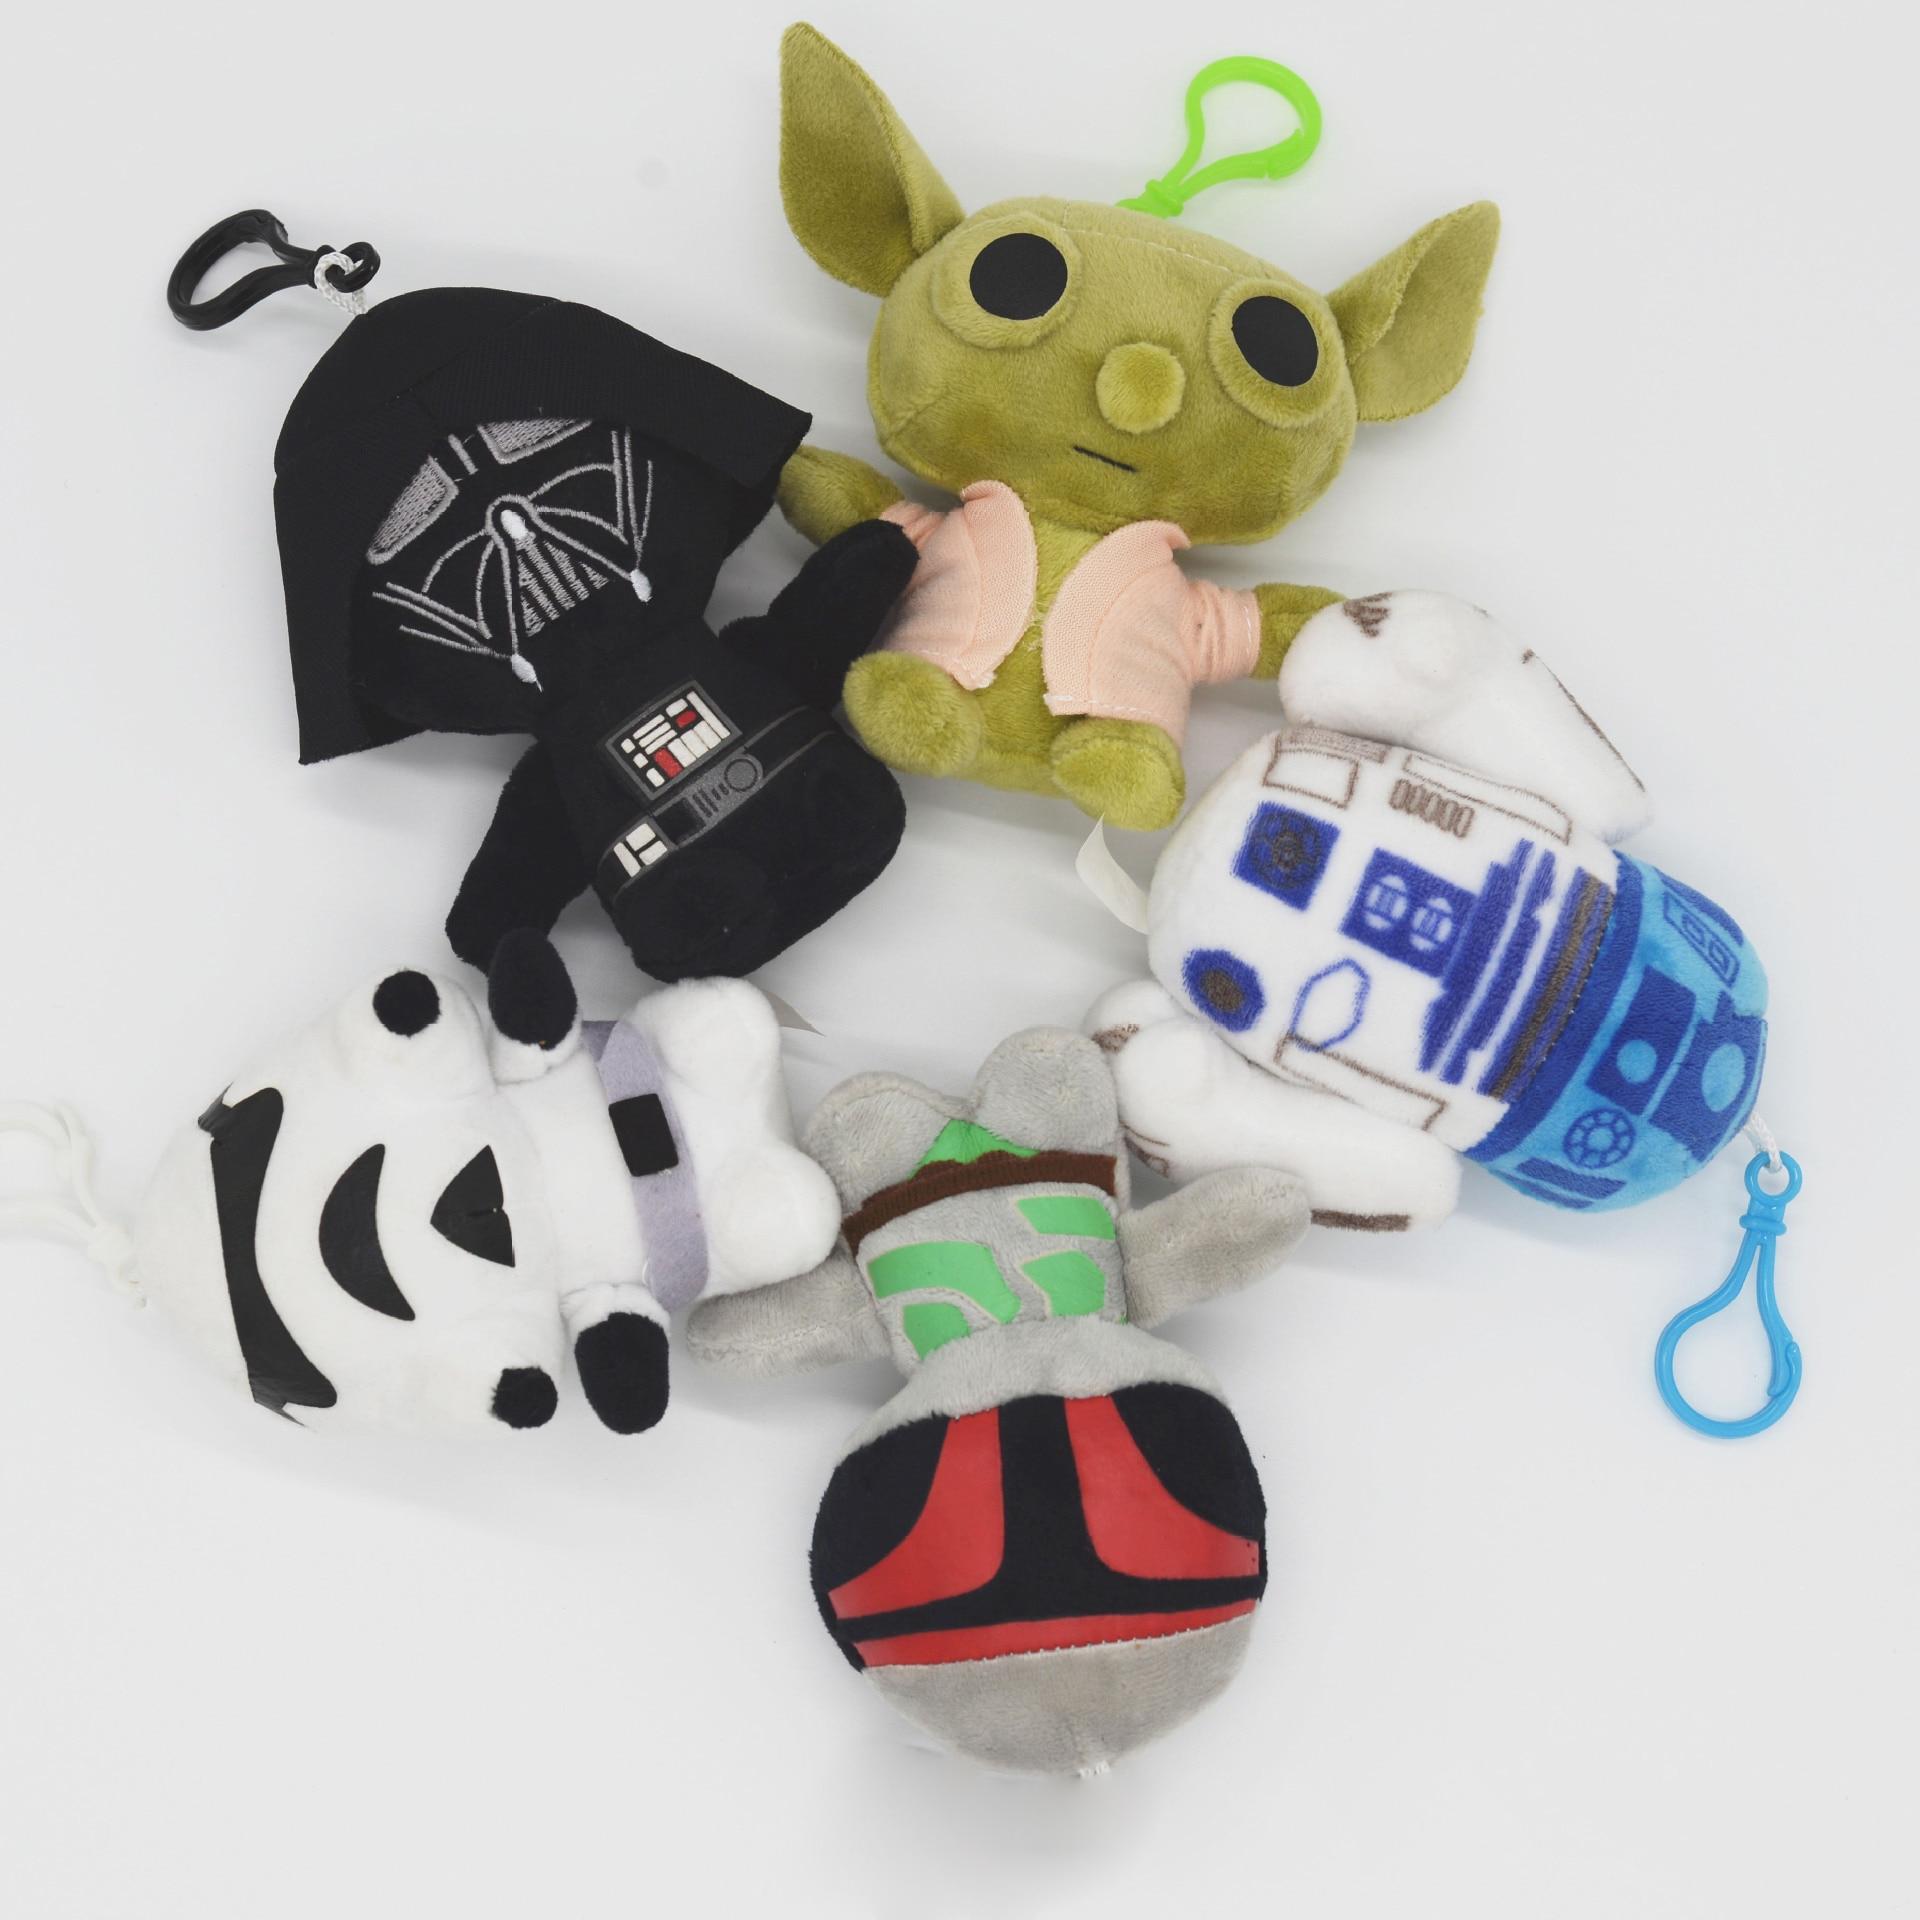 Star Wars Plush Soft Keychain Toys Starwars Yoda R2D2 Darth Vader White Imperial Army Plush Keychain Doll For Bag Decals